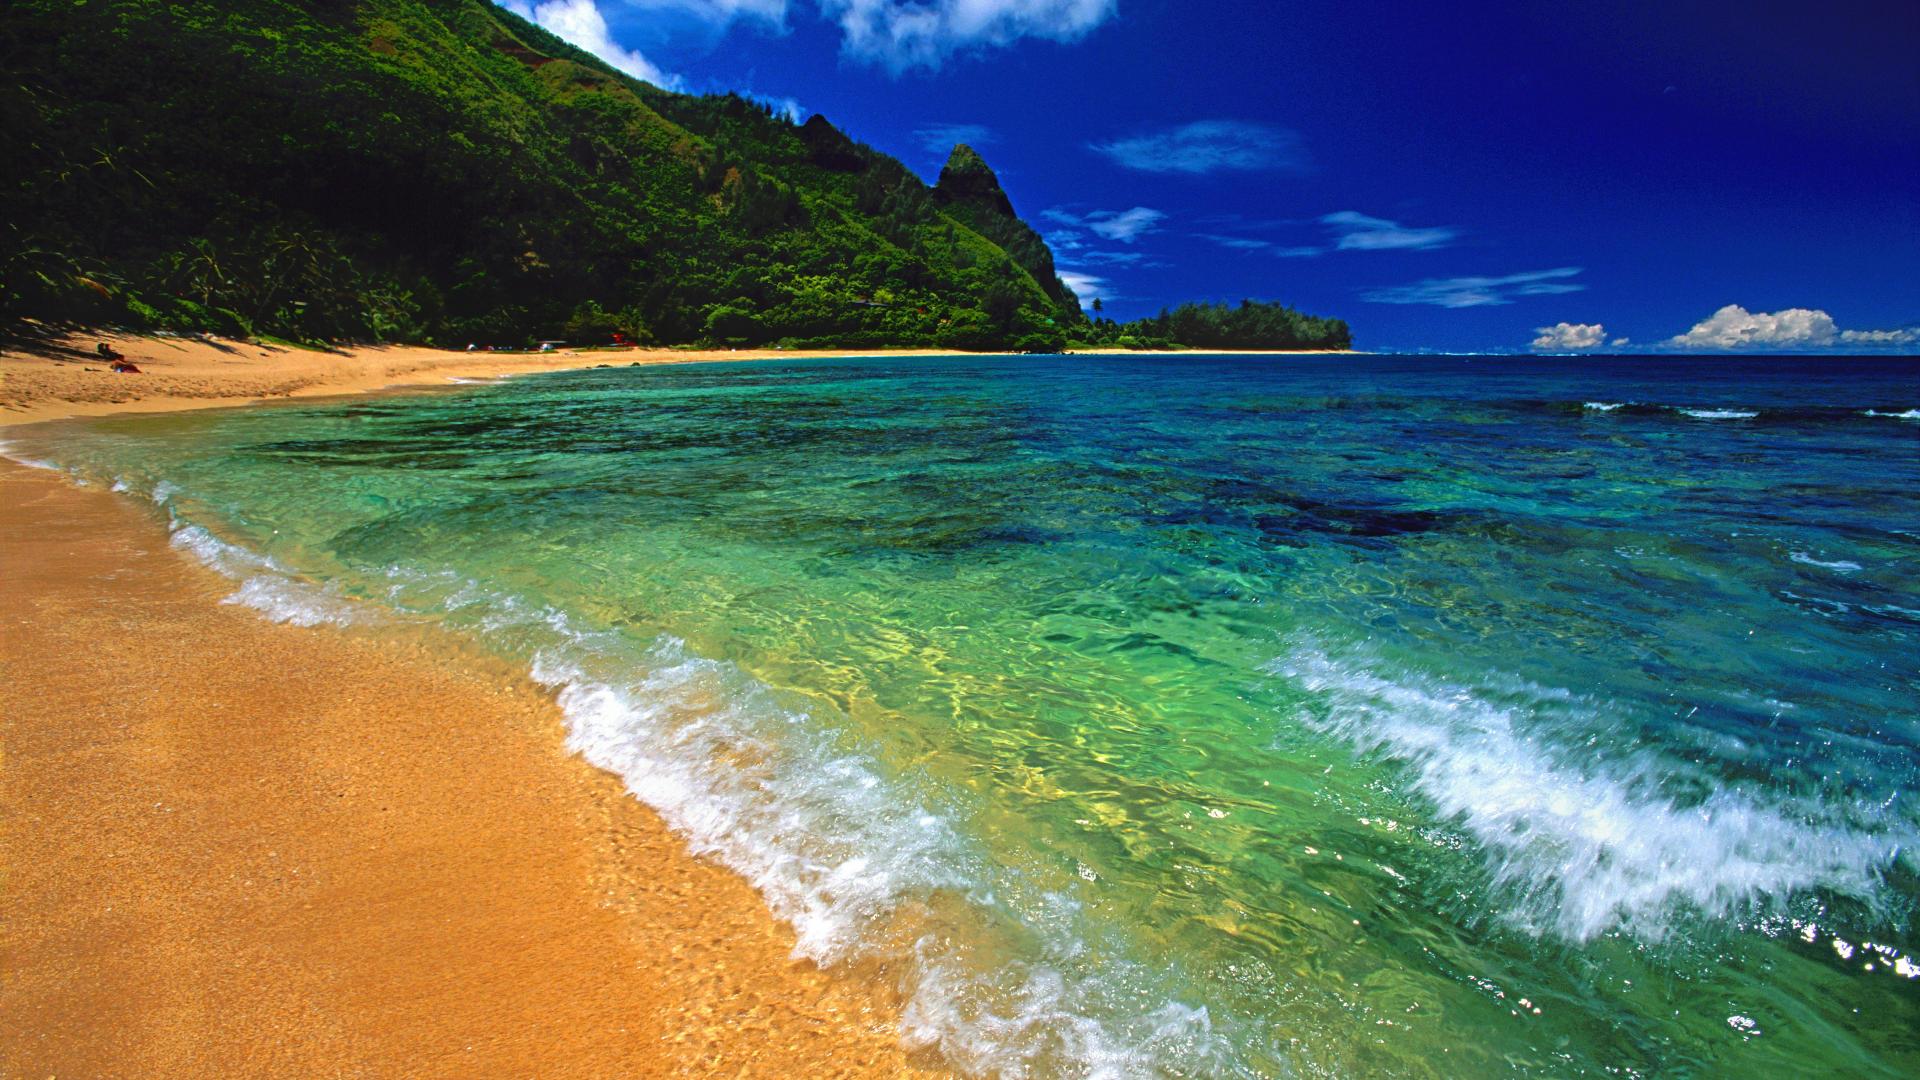 backgrounds for hawaii beach scene desktop background www jpg 1920x1080 hawaii beach scene desktop background